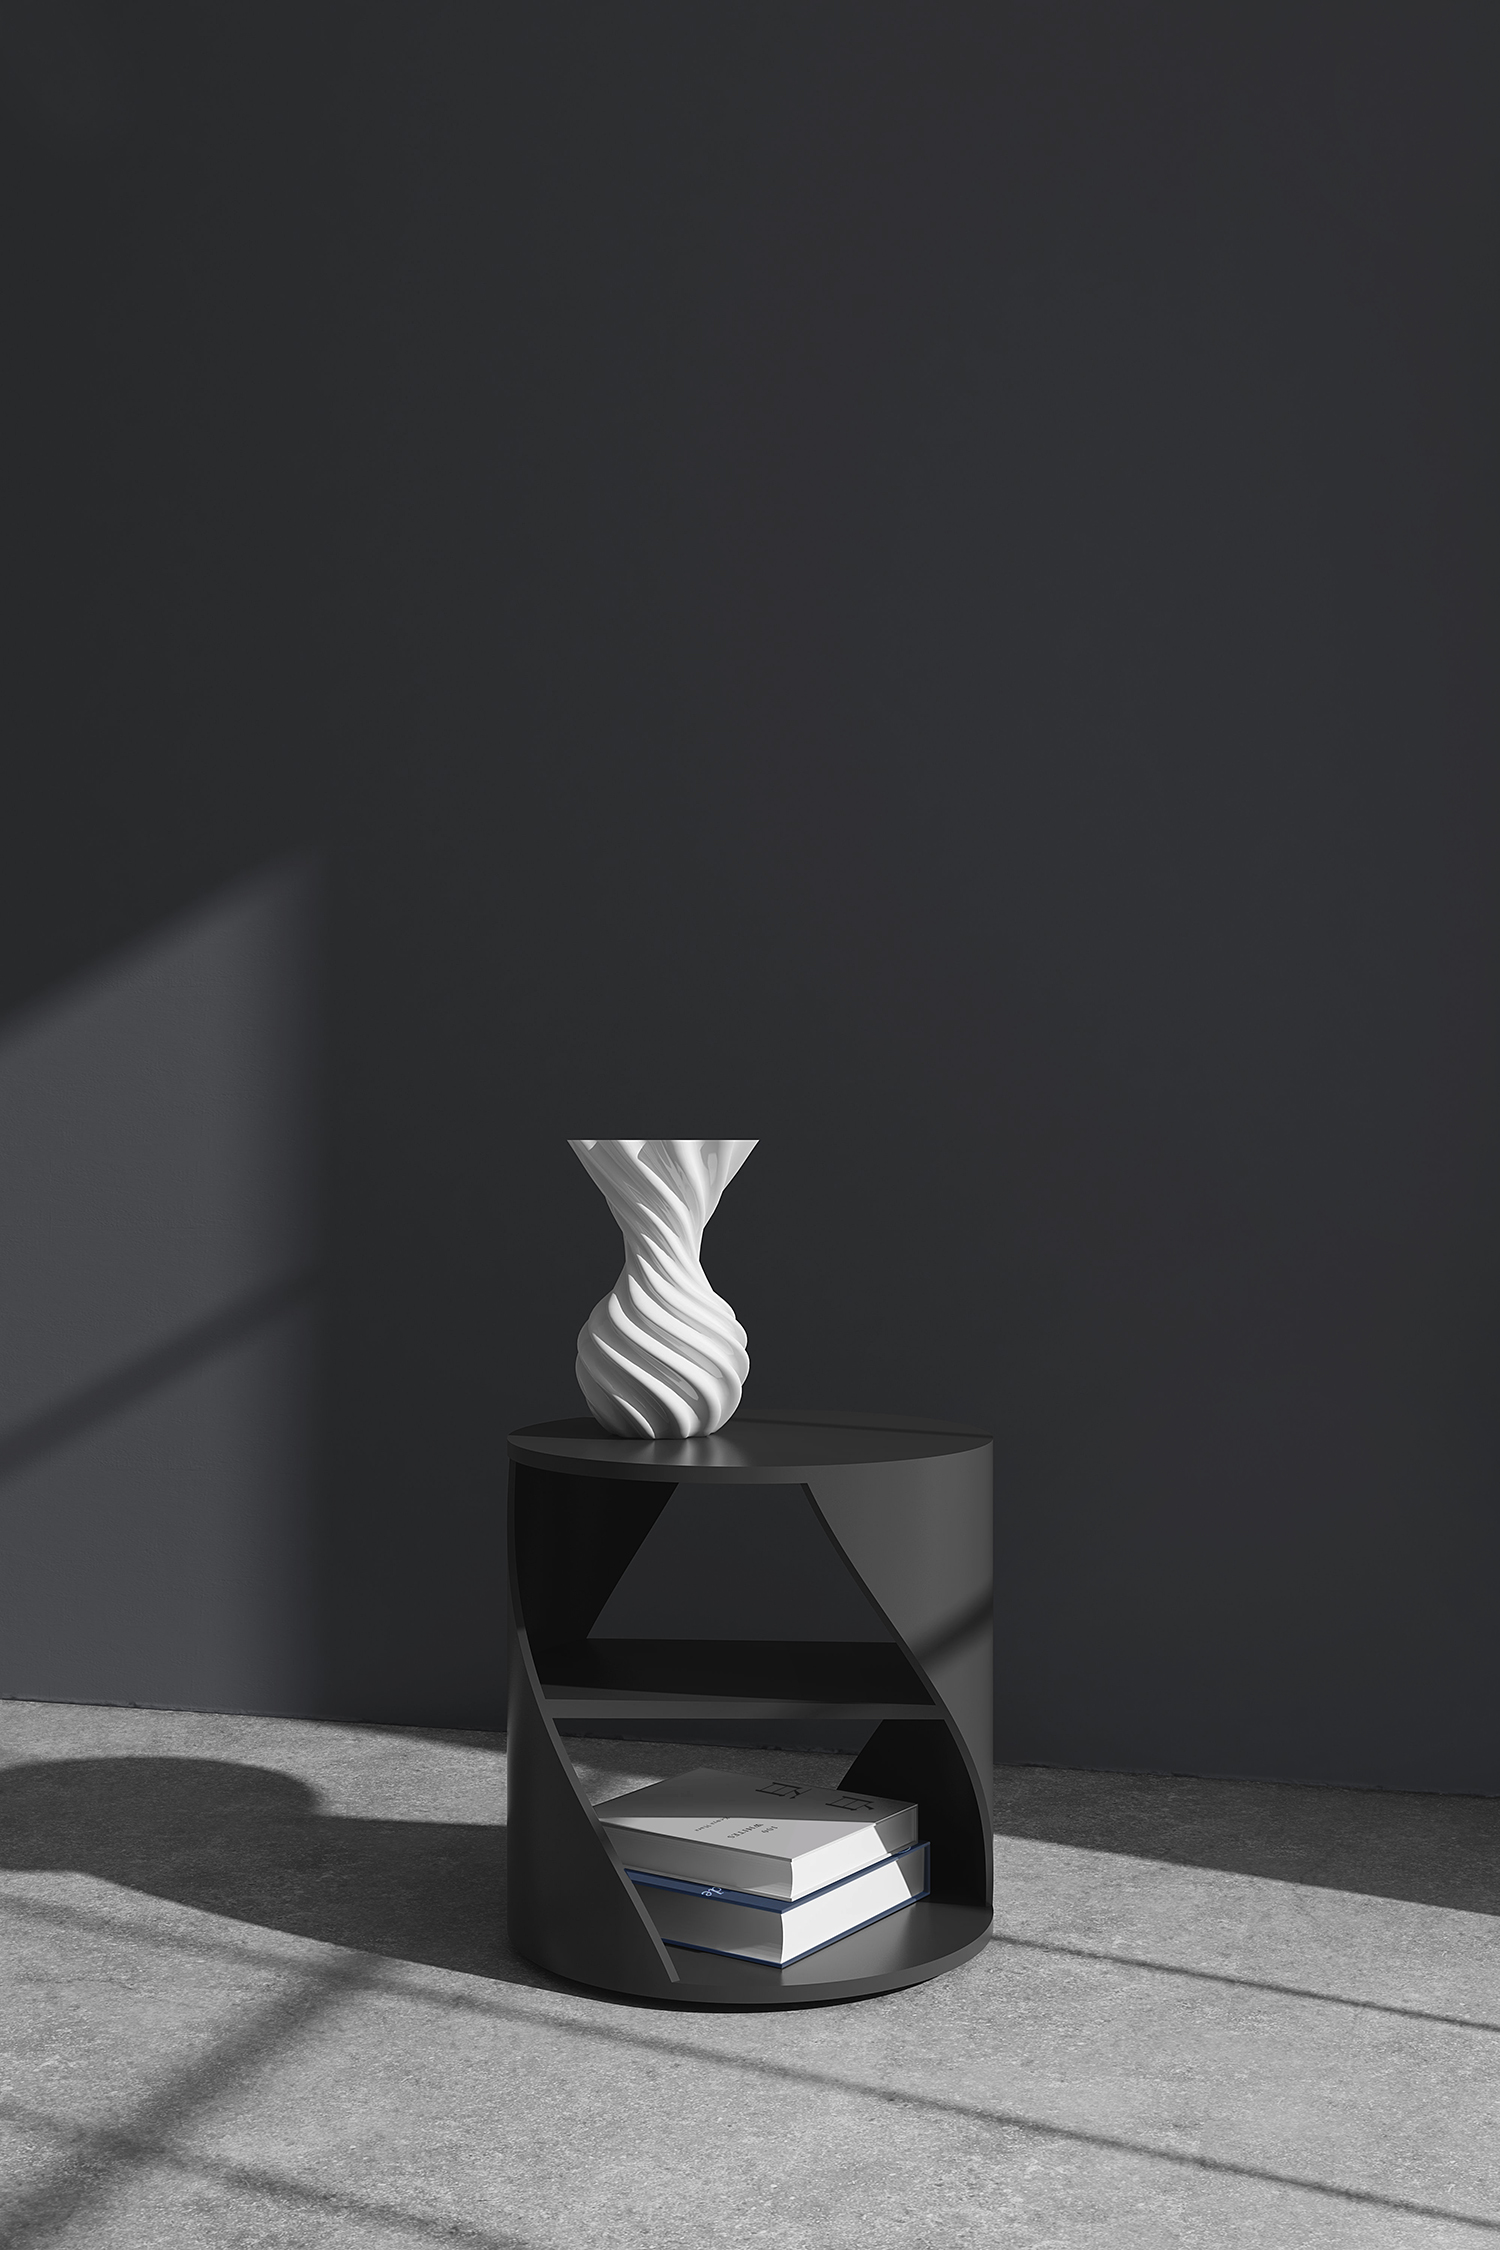 Mydna by Joel Escalona for Nono — 07.jpg